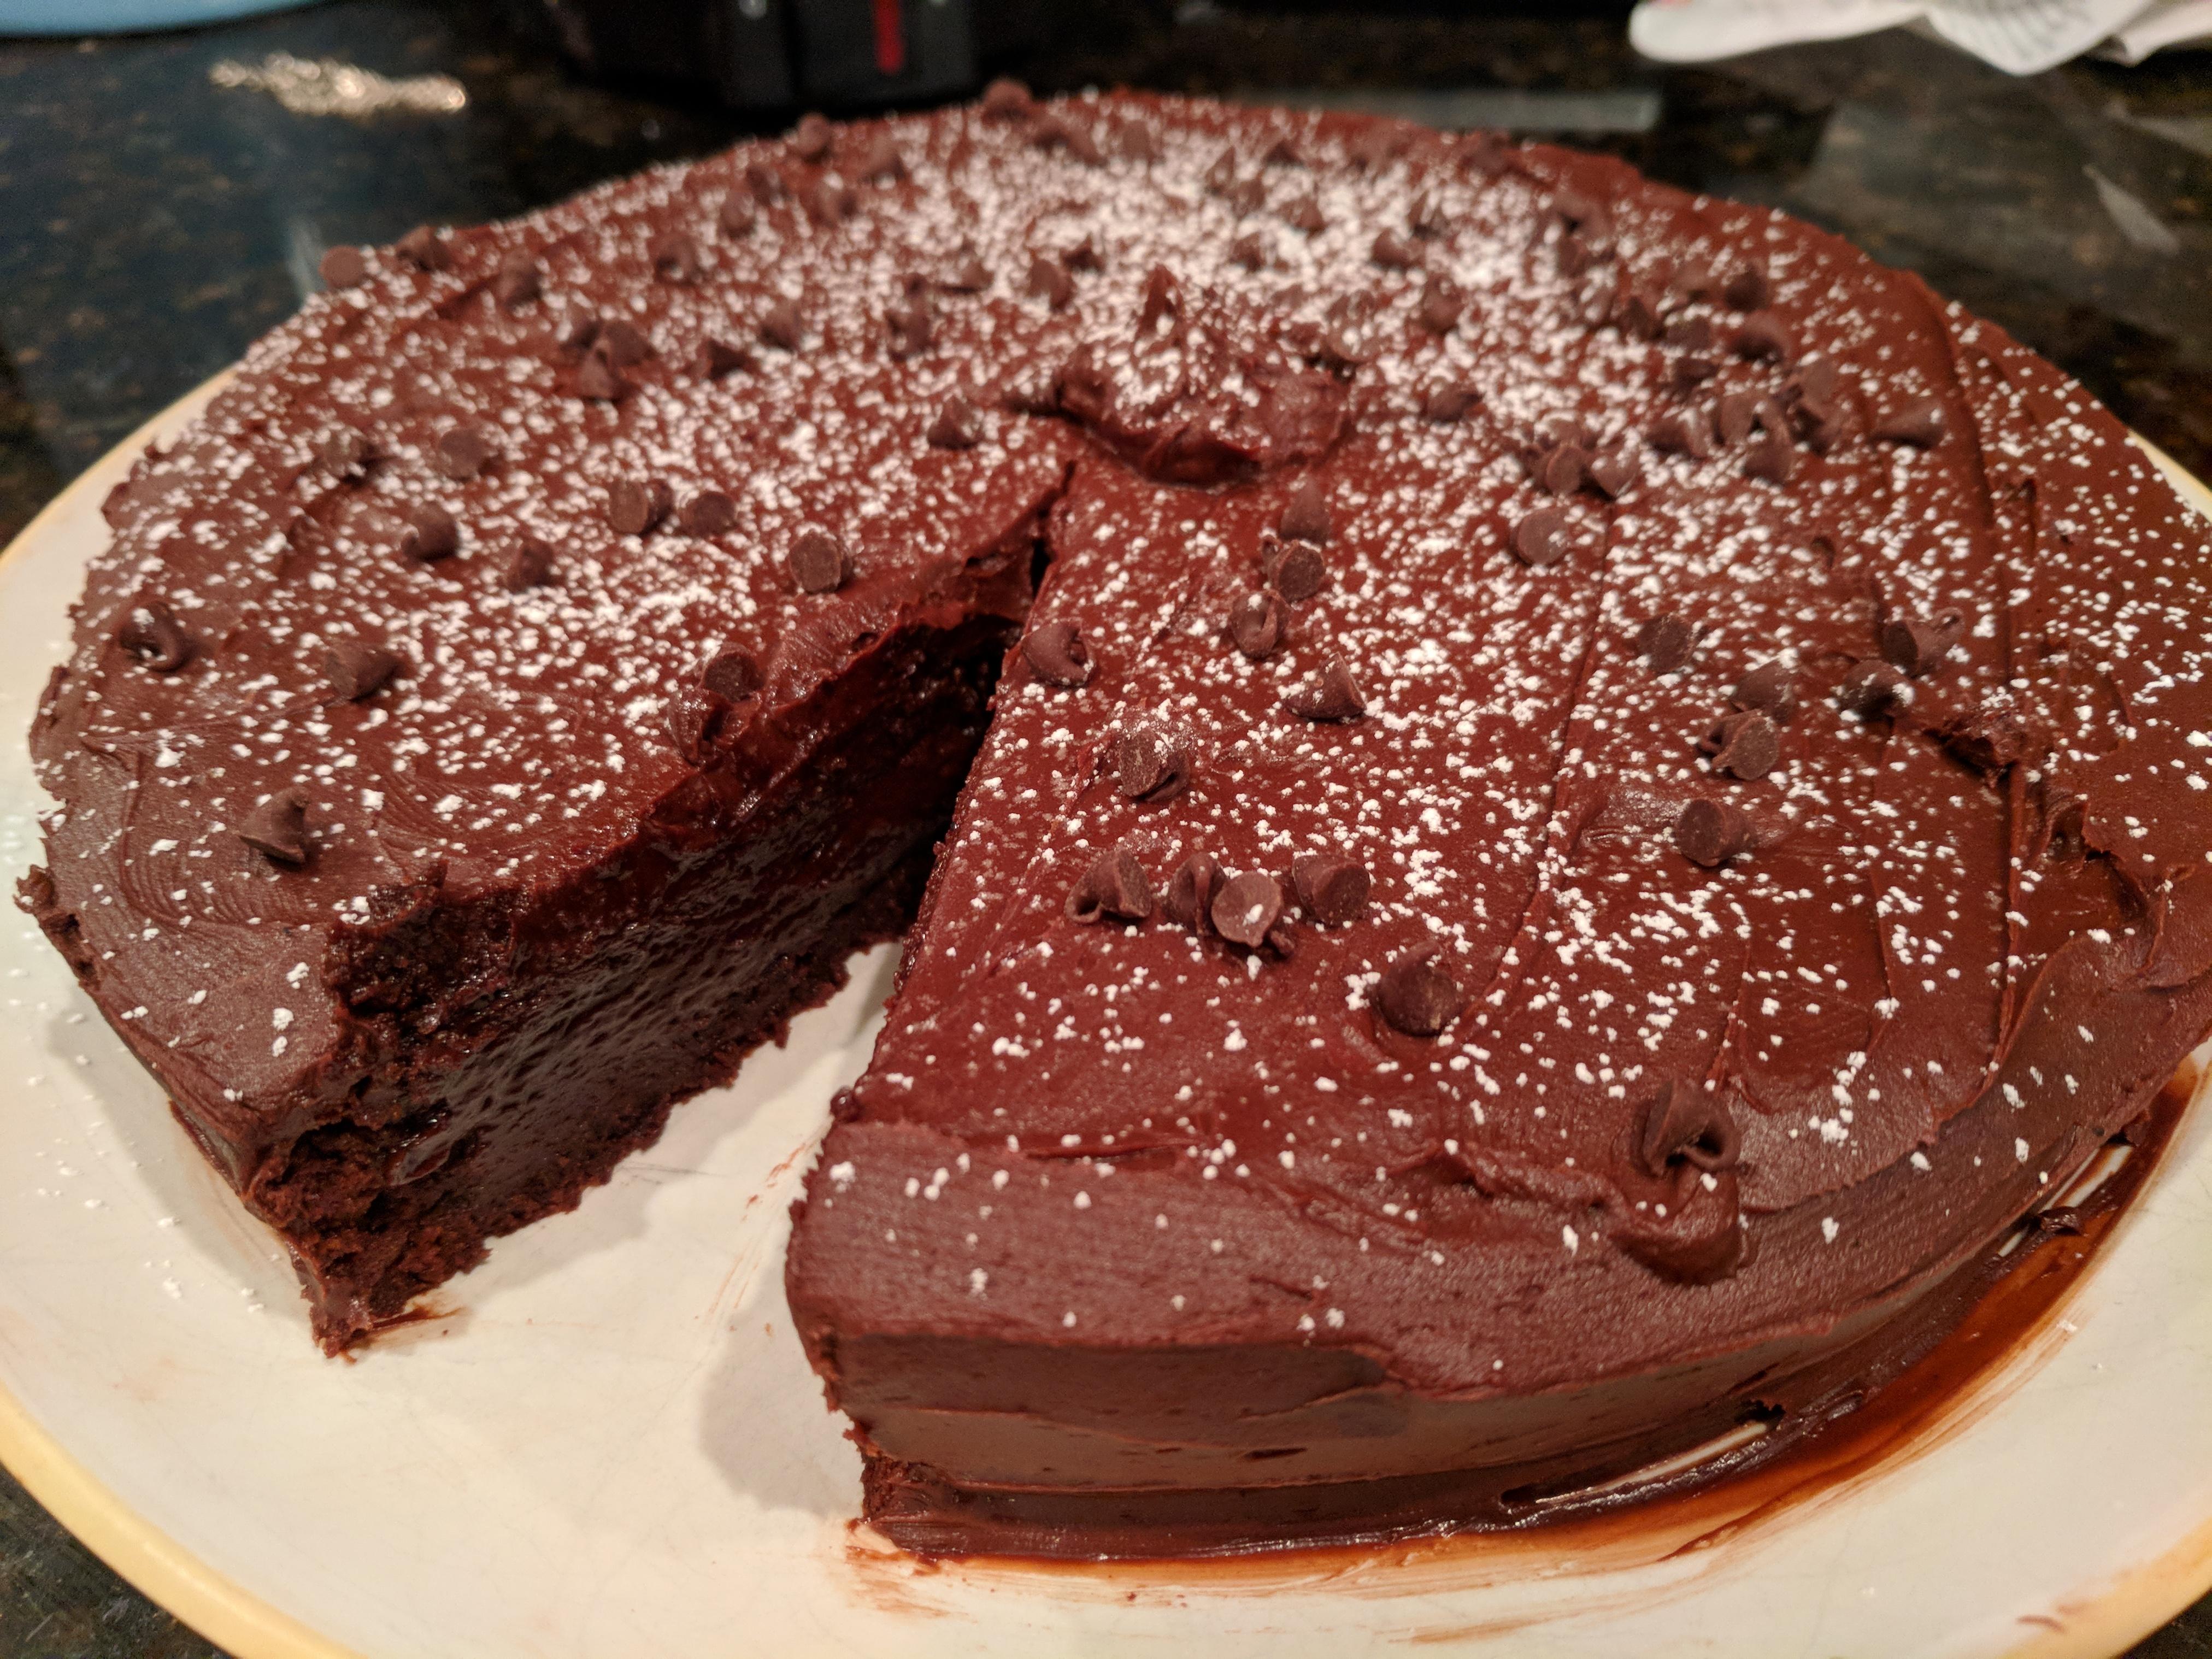 Chef John's Chocolate Decadence swerblin